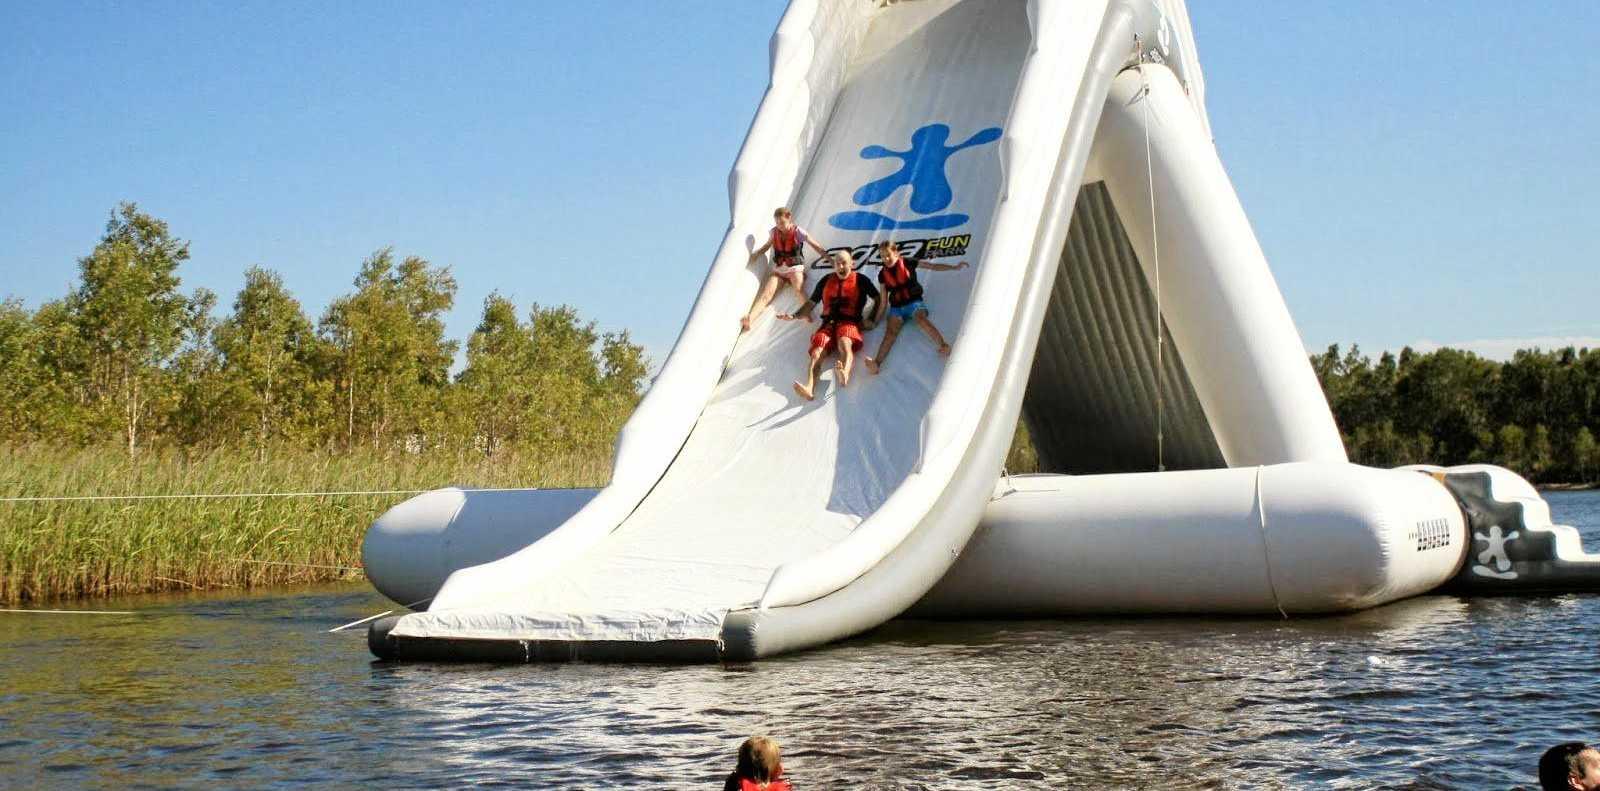 Aqua Fun Park in Mackay won't reopen over the school holidays, operators say.